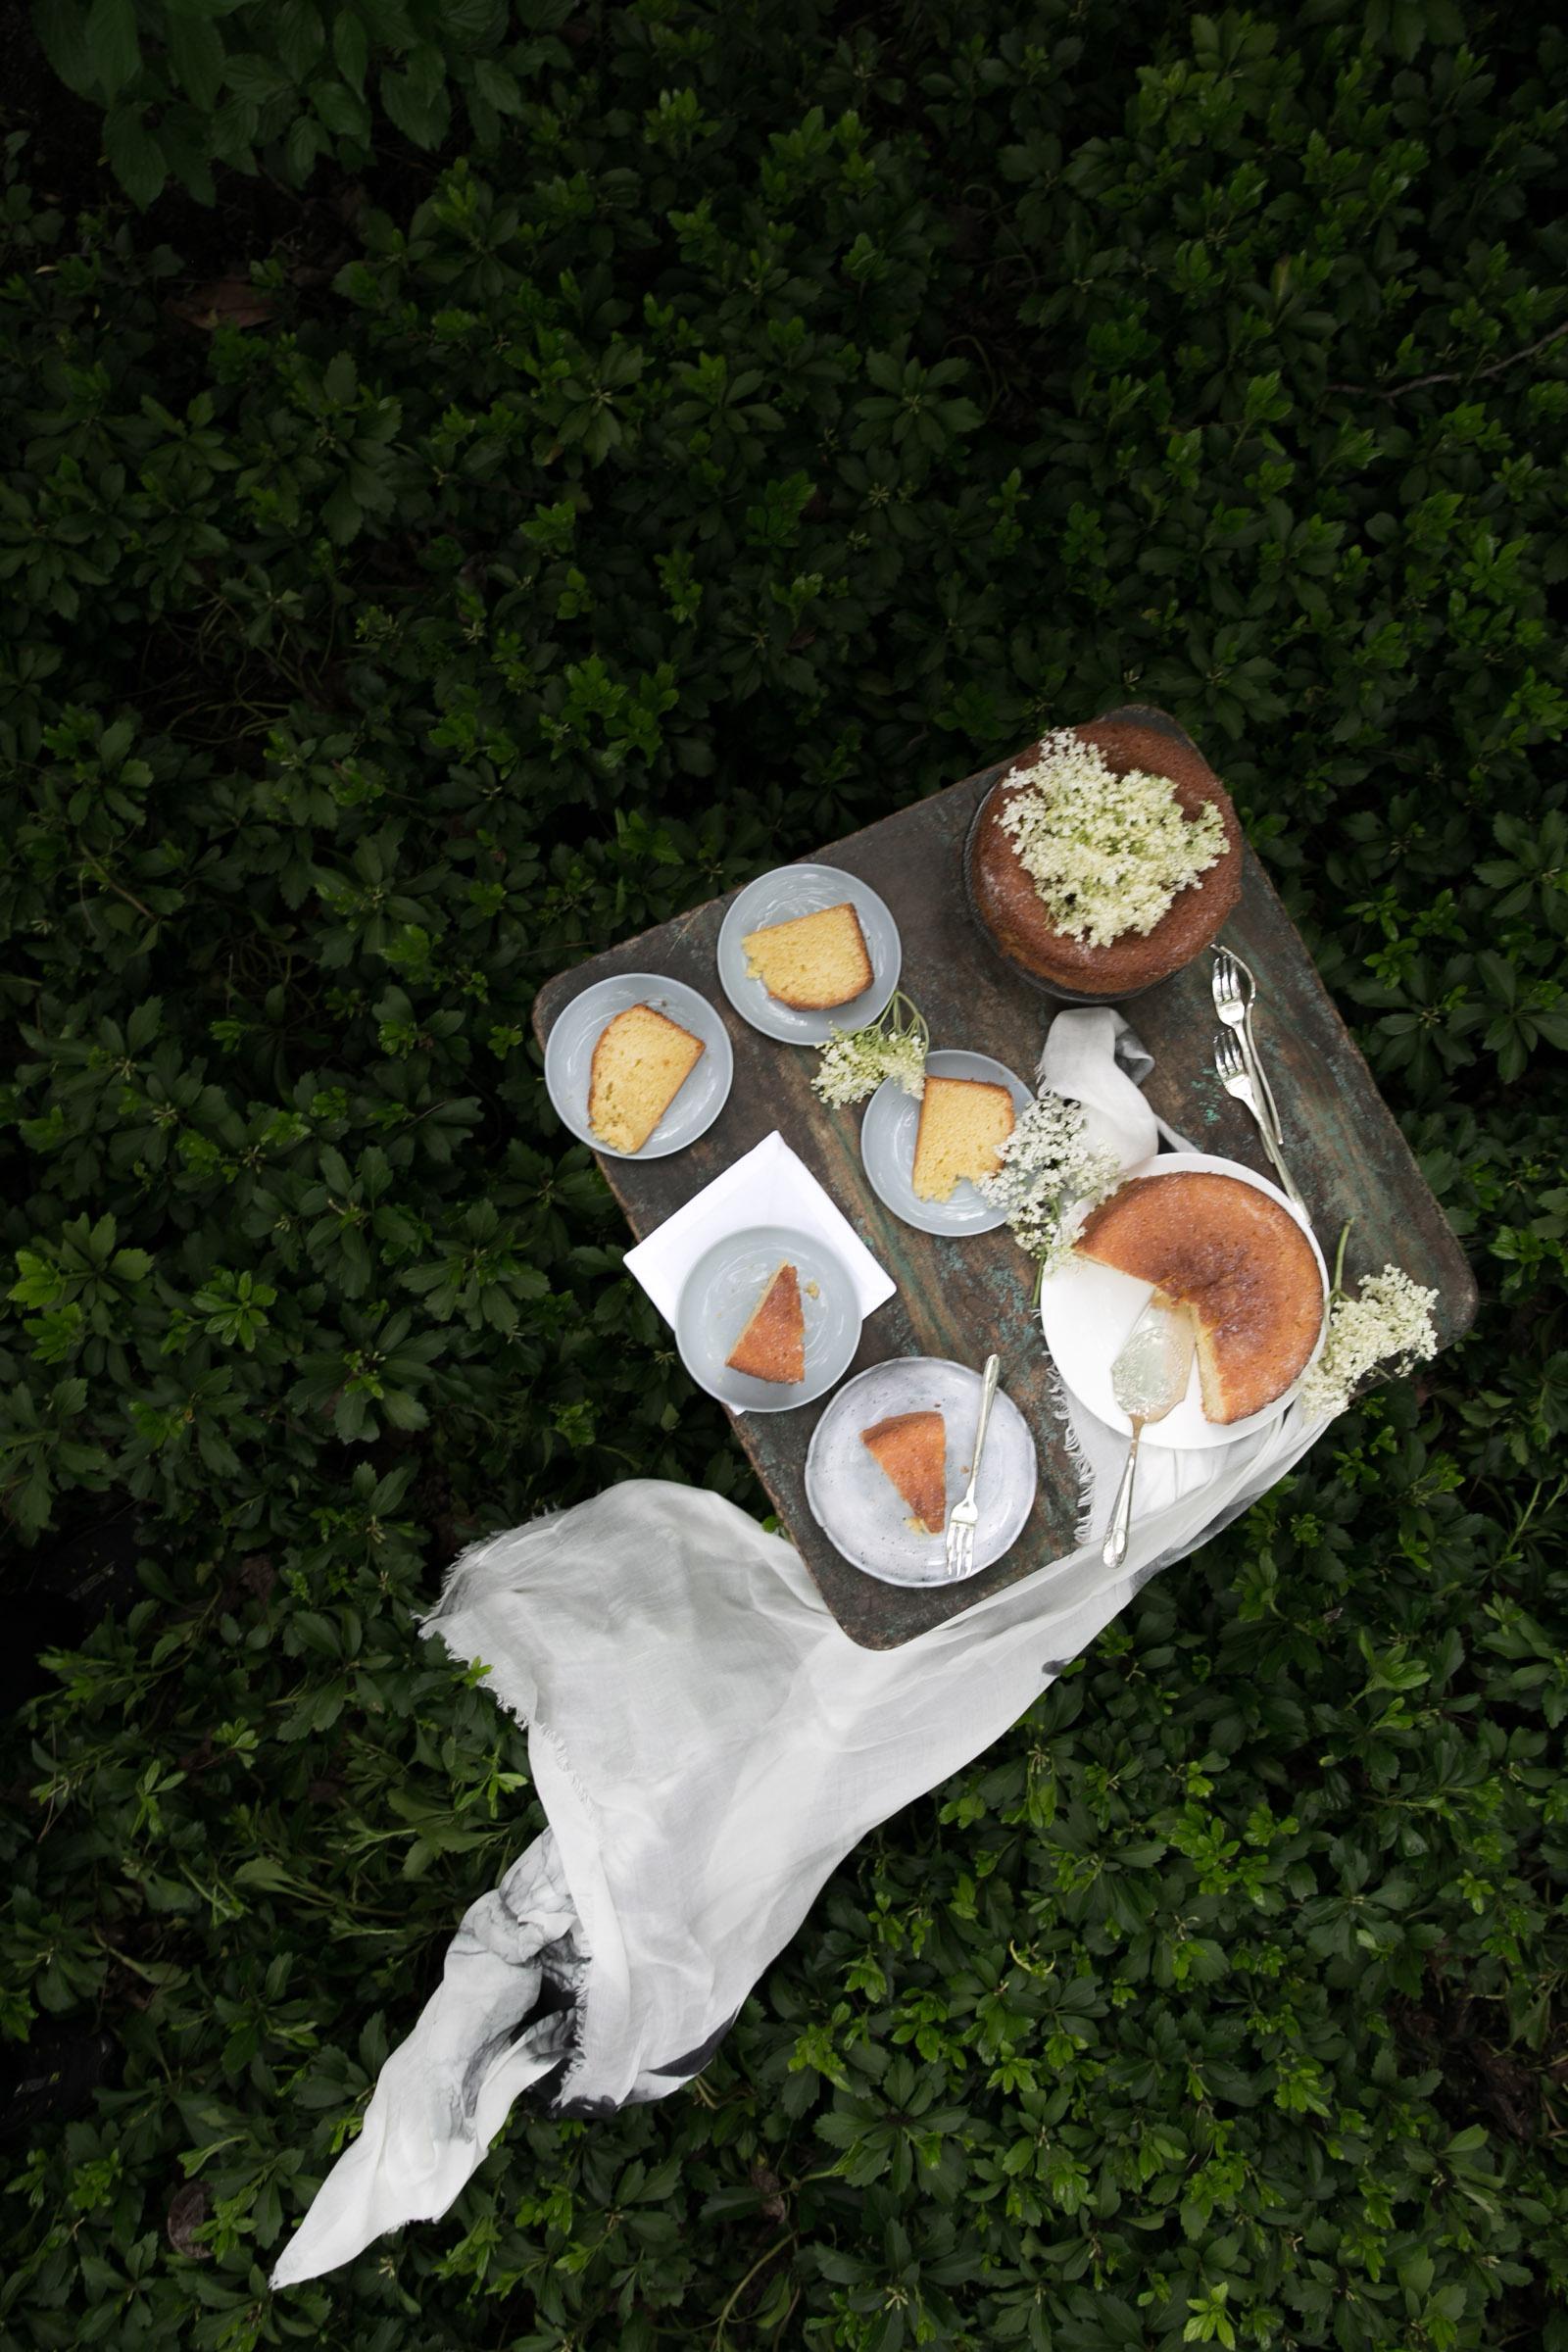 Cake for picnic